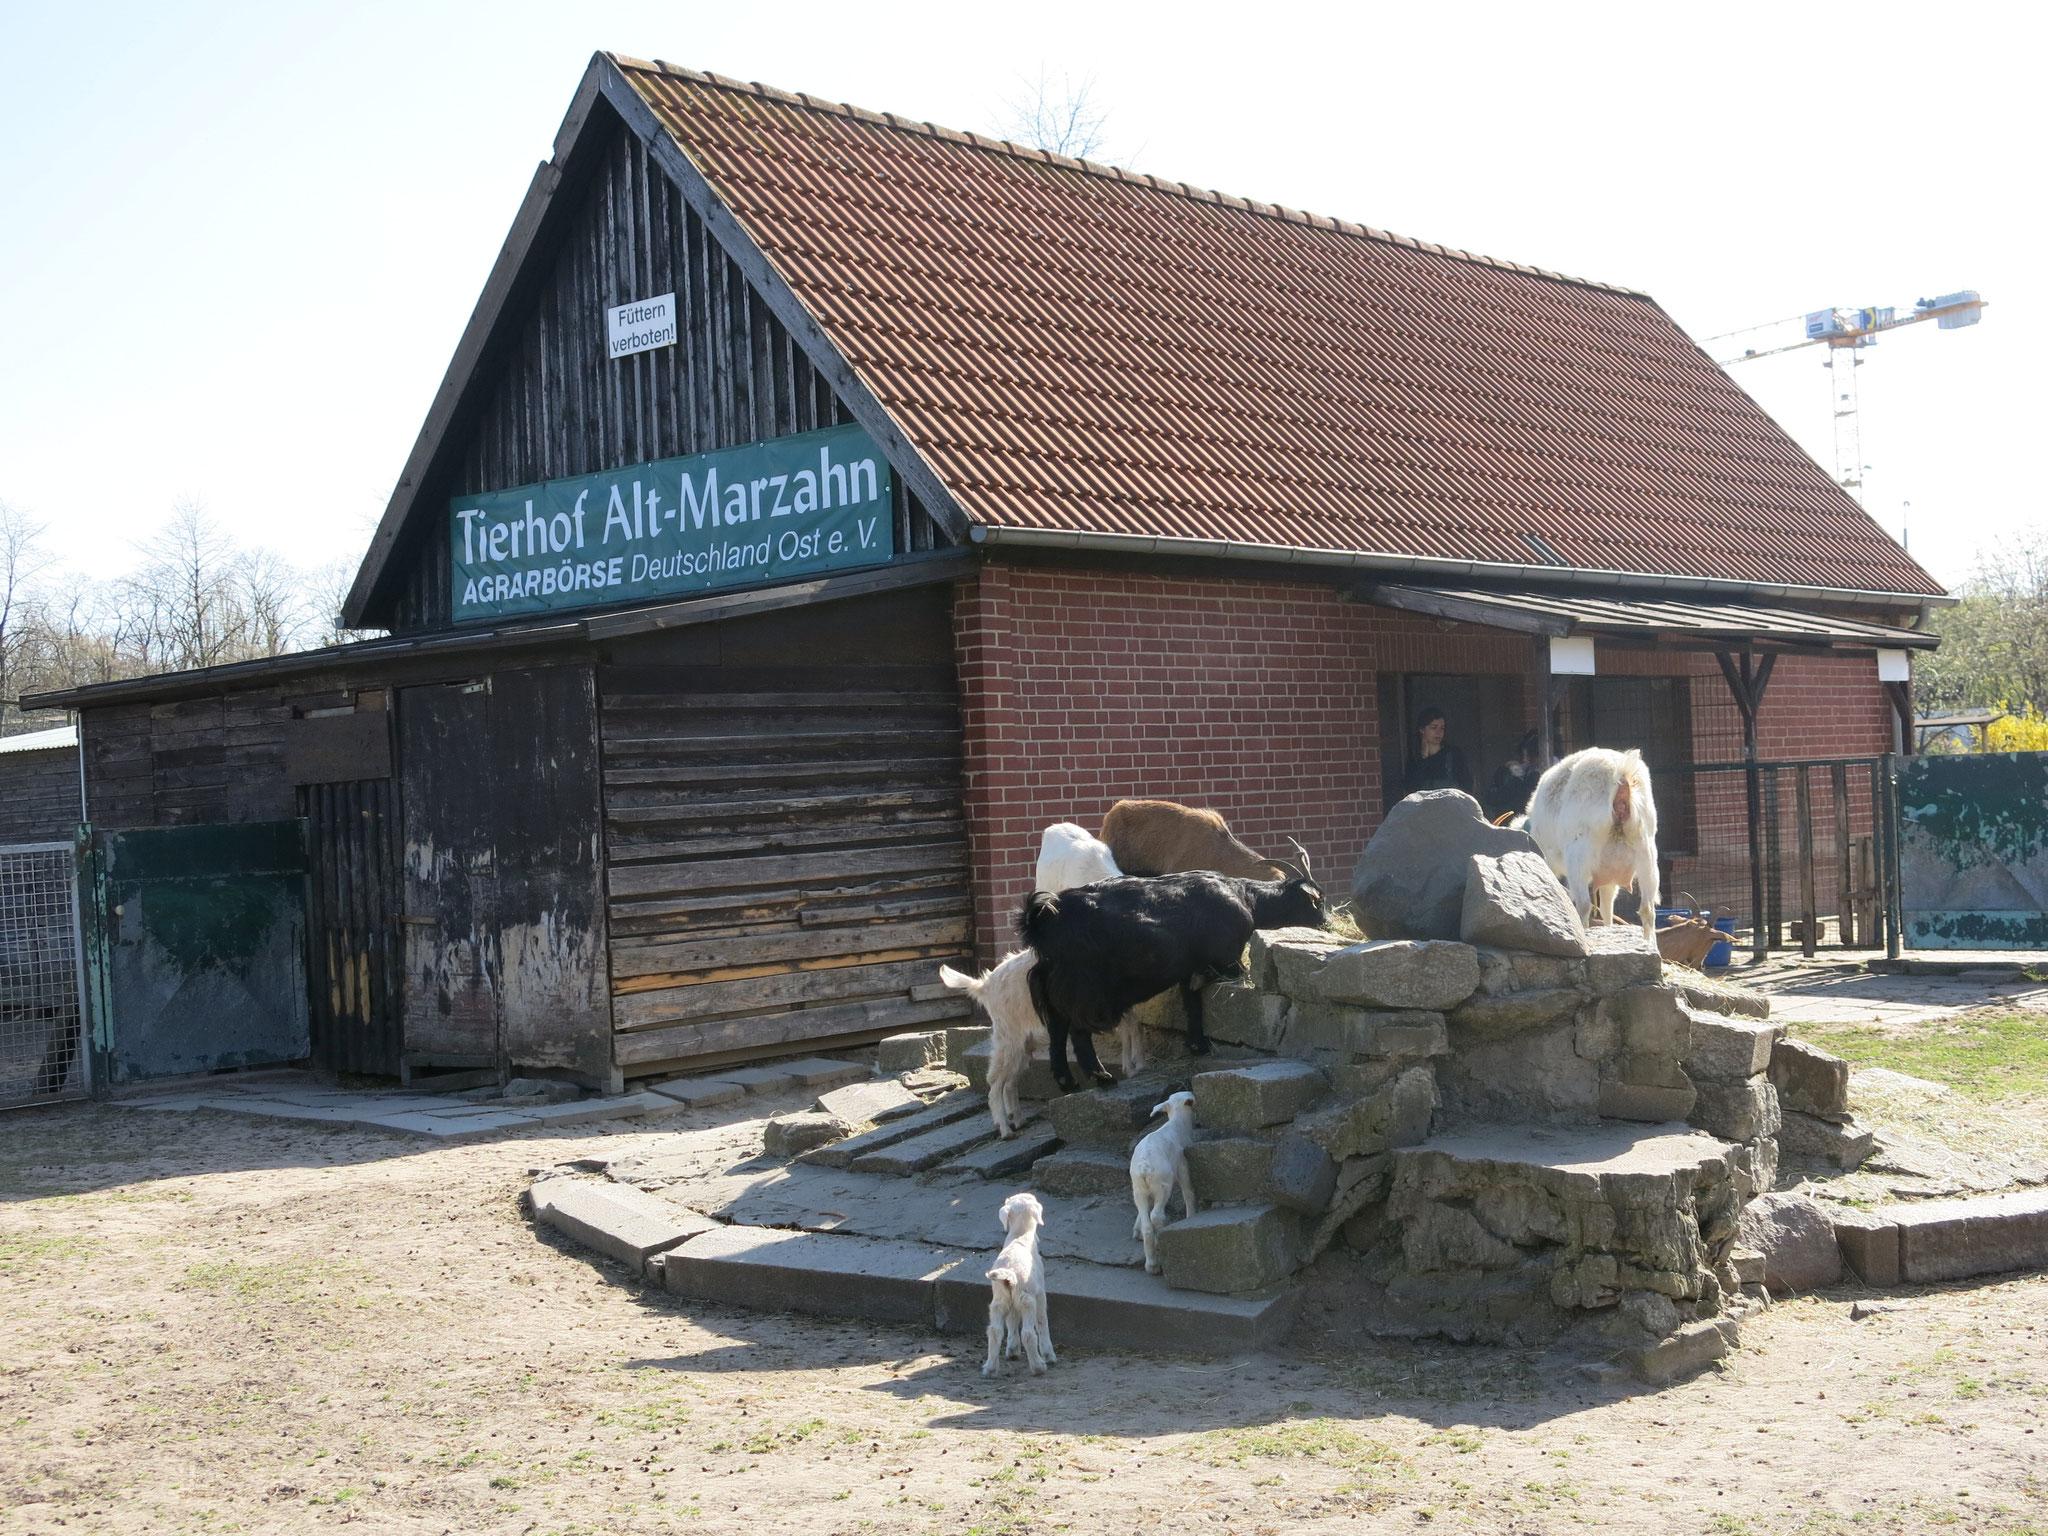 Sa+So, 17.+18.07. | 11.00-15.00 Uhr: Ausflug zum Tierhof Alt-Marzahn